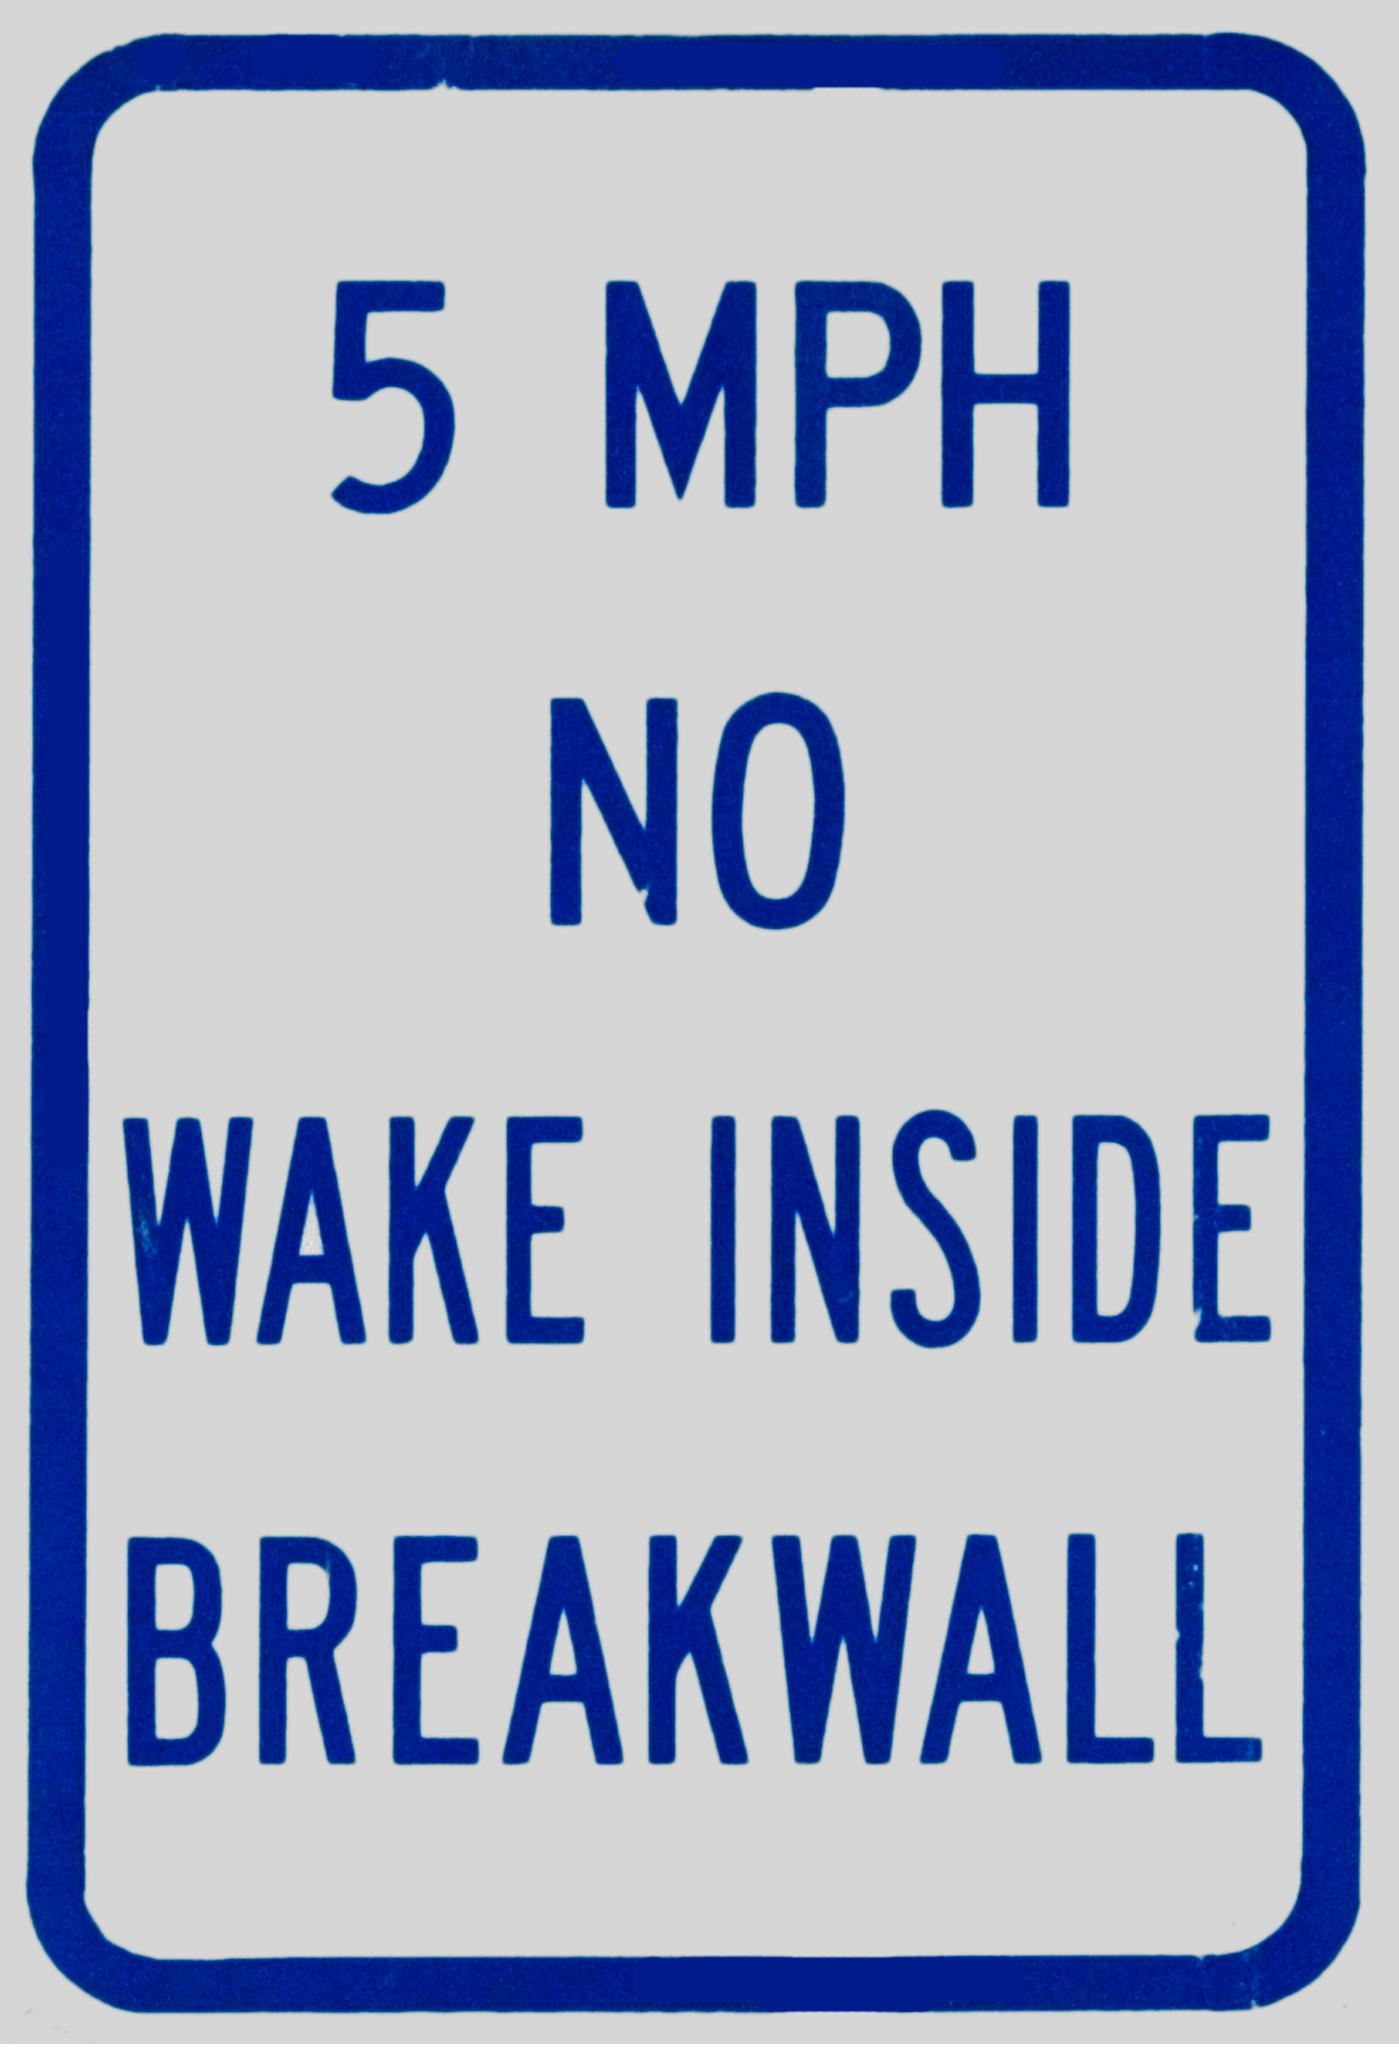 5 MPH No Breakwall.png